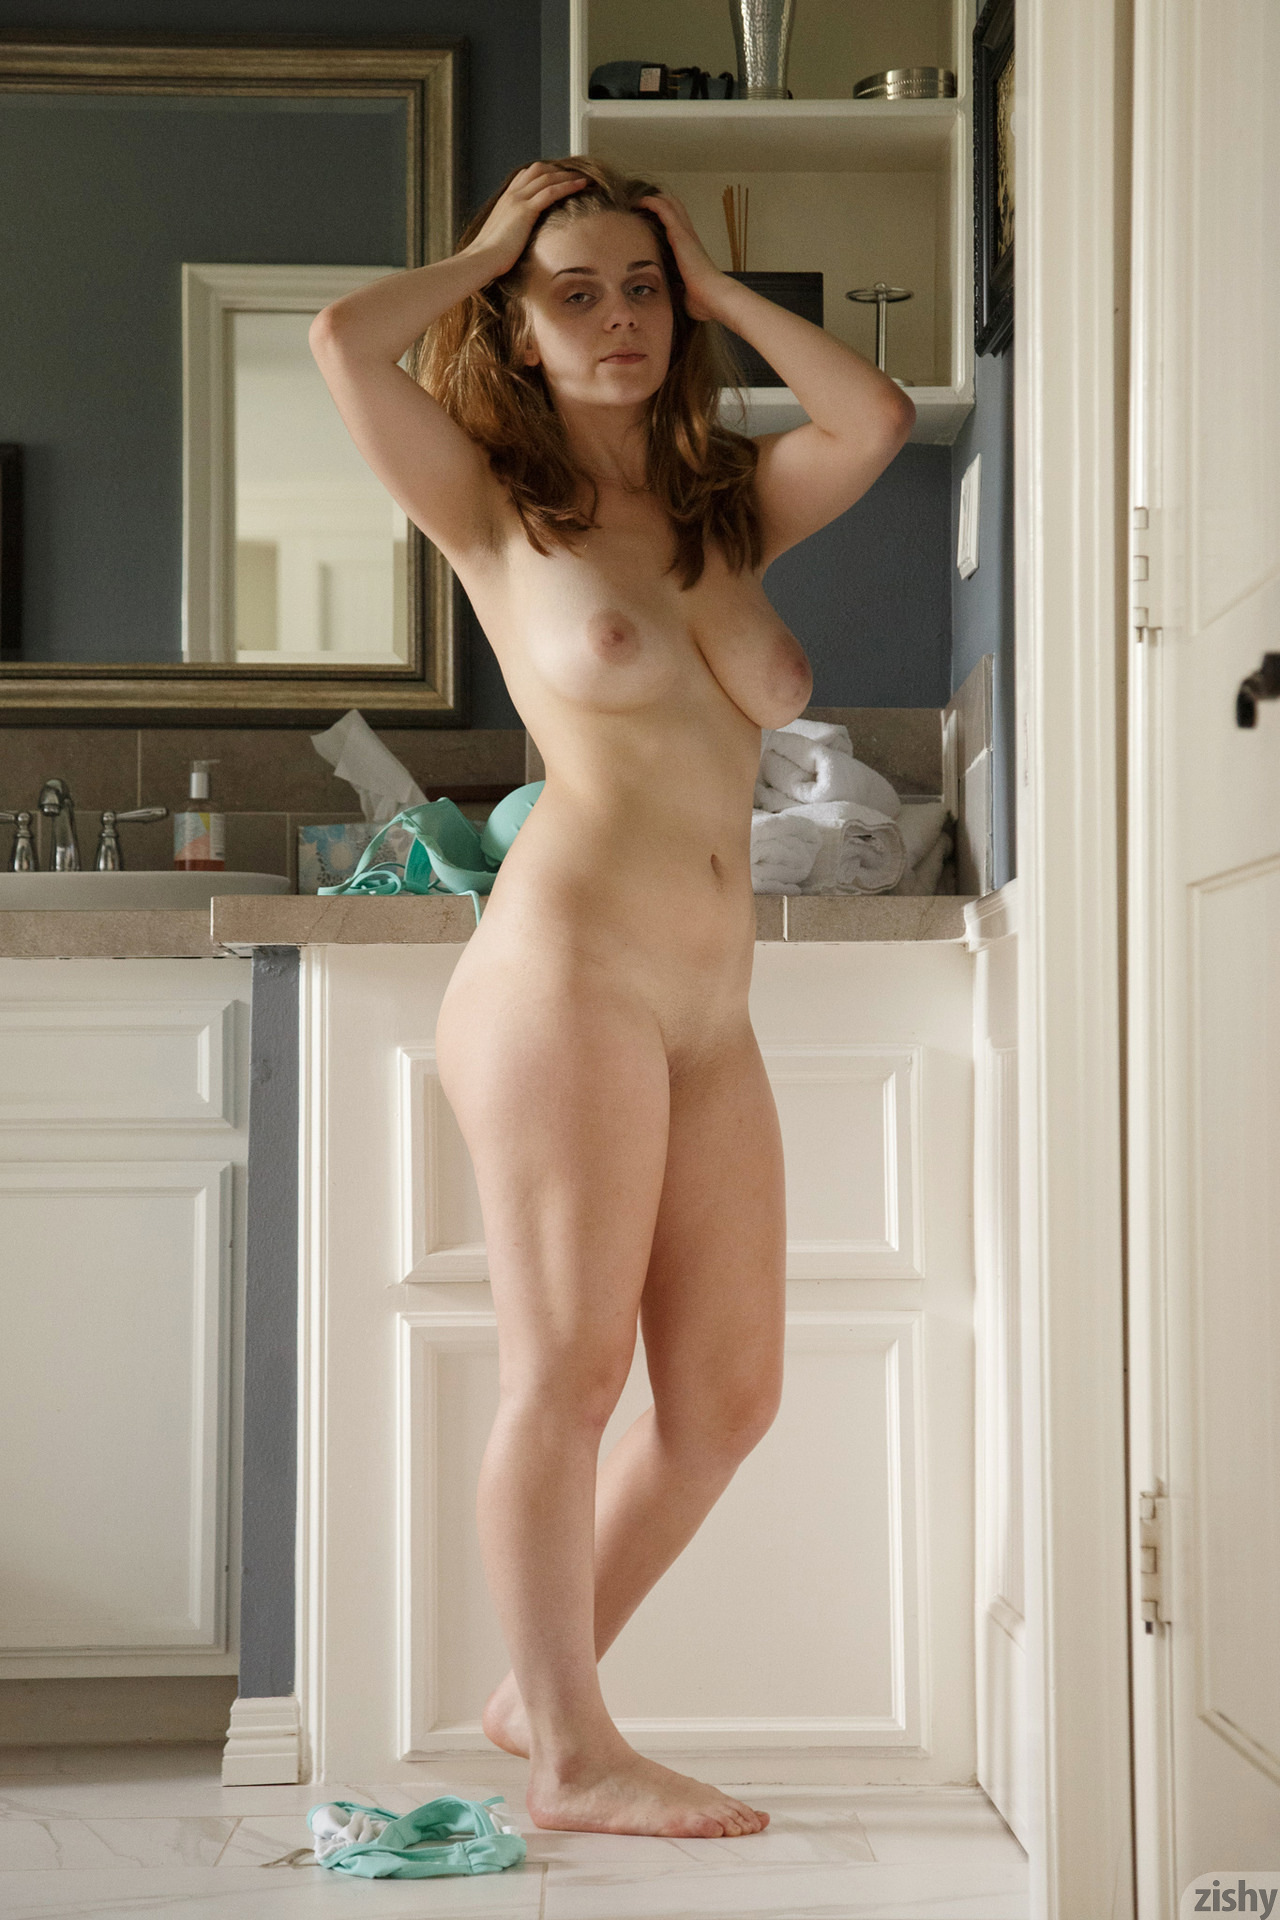 Natalie Austin No Clothes Needed Zishy - Curvy Erotic-4605